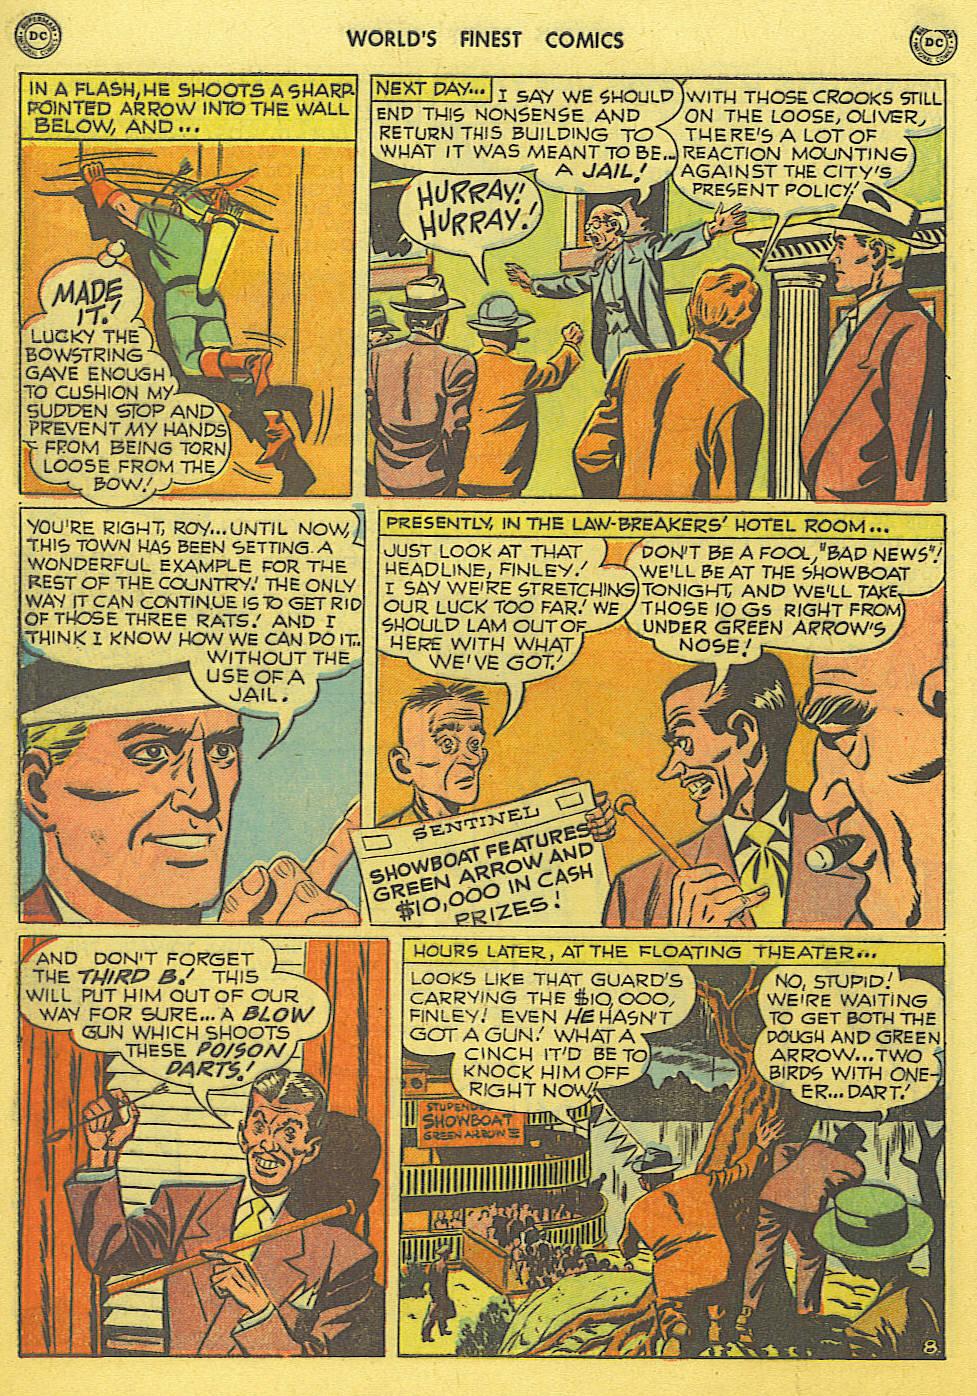 Read online World's Finest Comics comic -  Issue #49 - 25